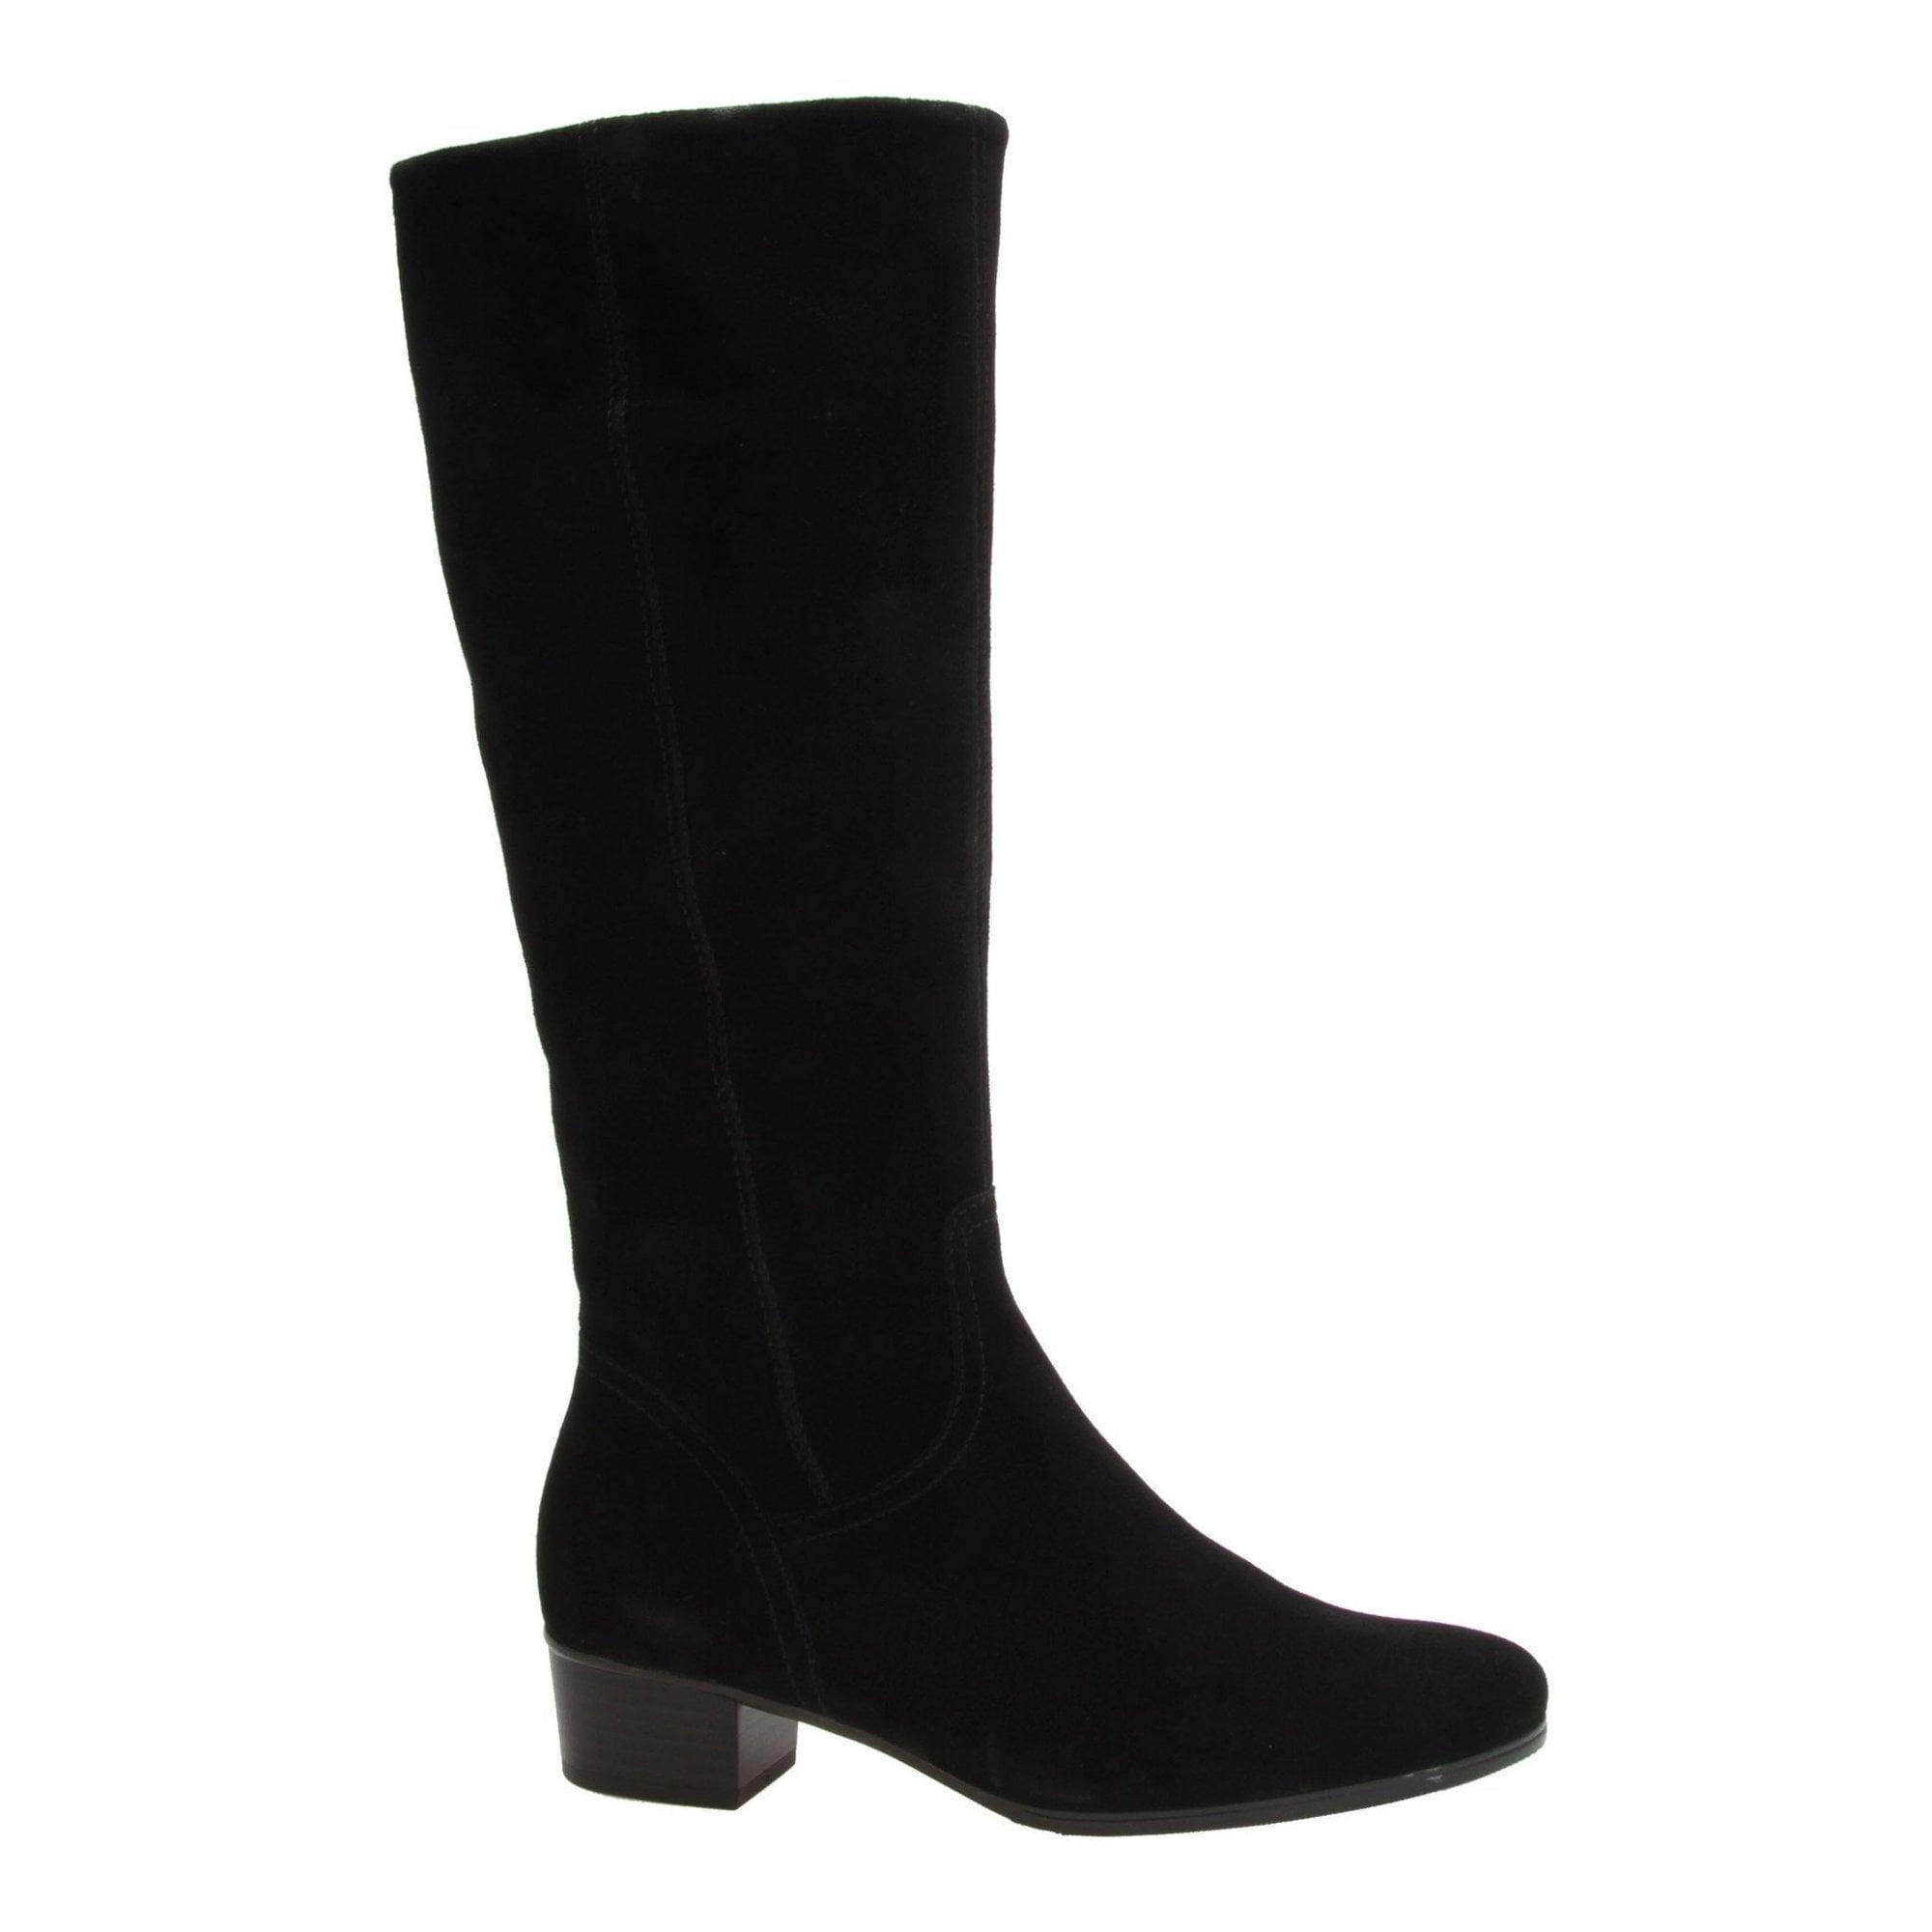 Gabor Toye S Long SLIM Leg Suede Boot